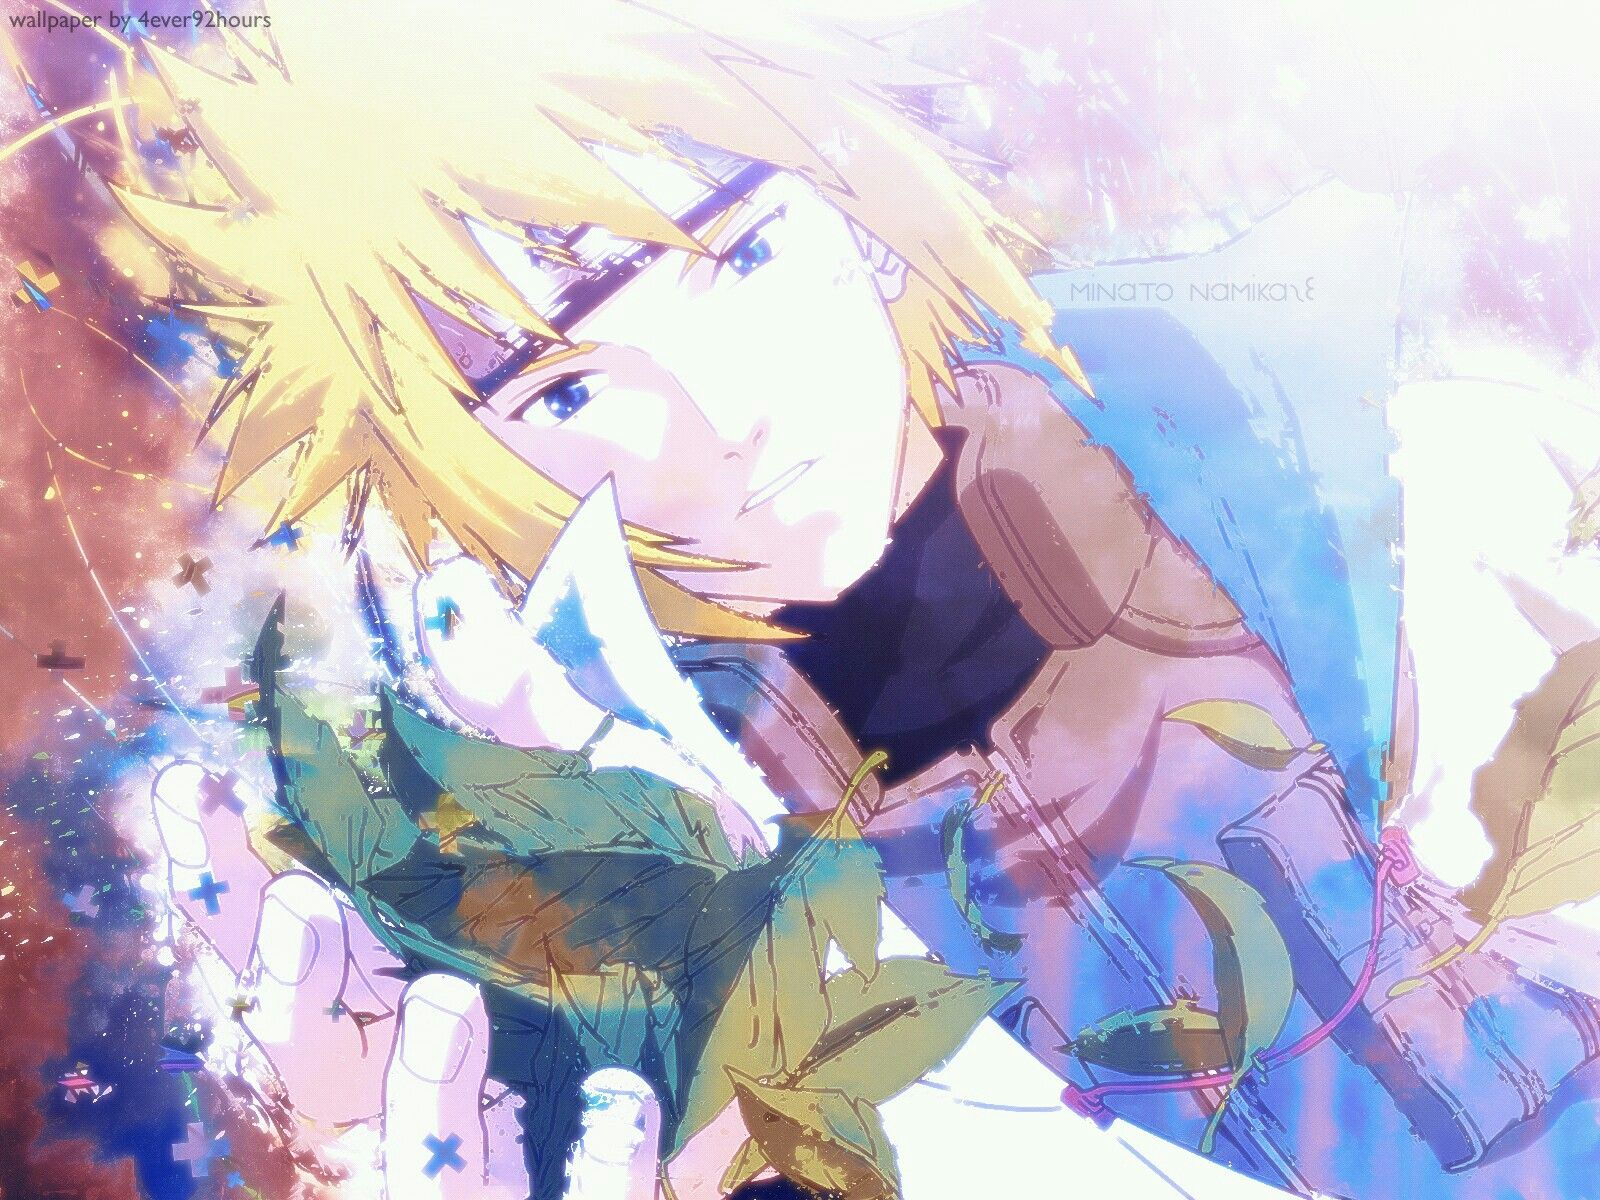 Pin by Raifona on Anime Anime, Naruto pictures